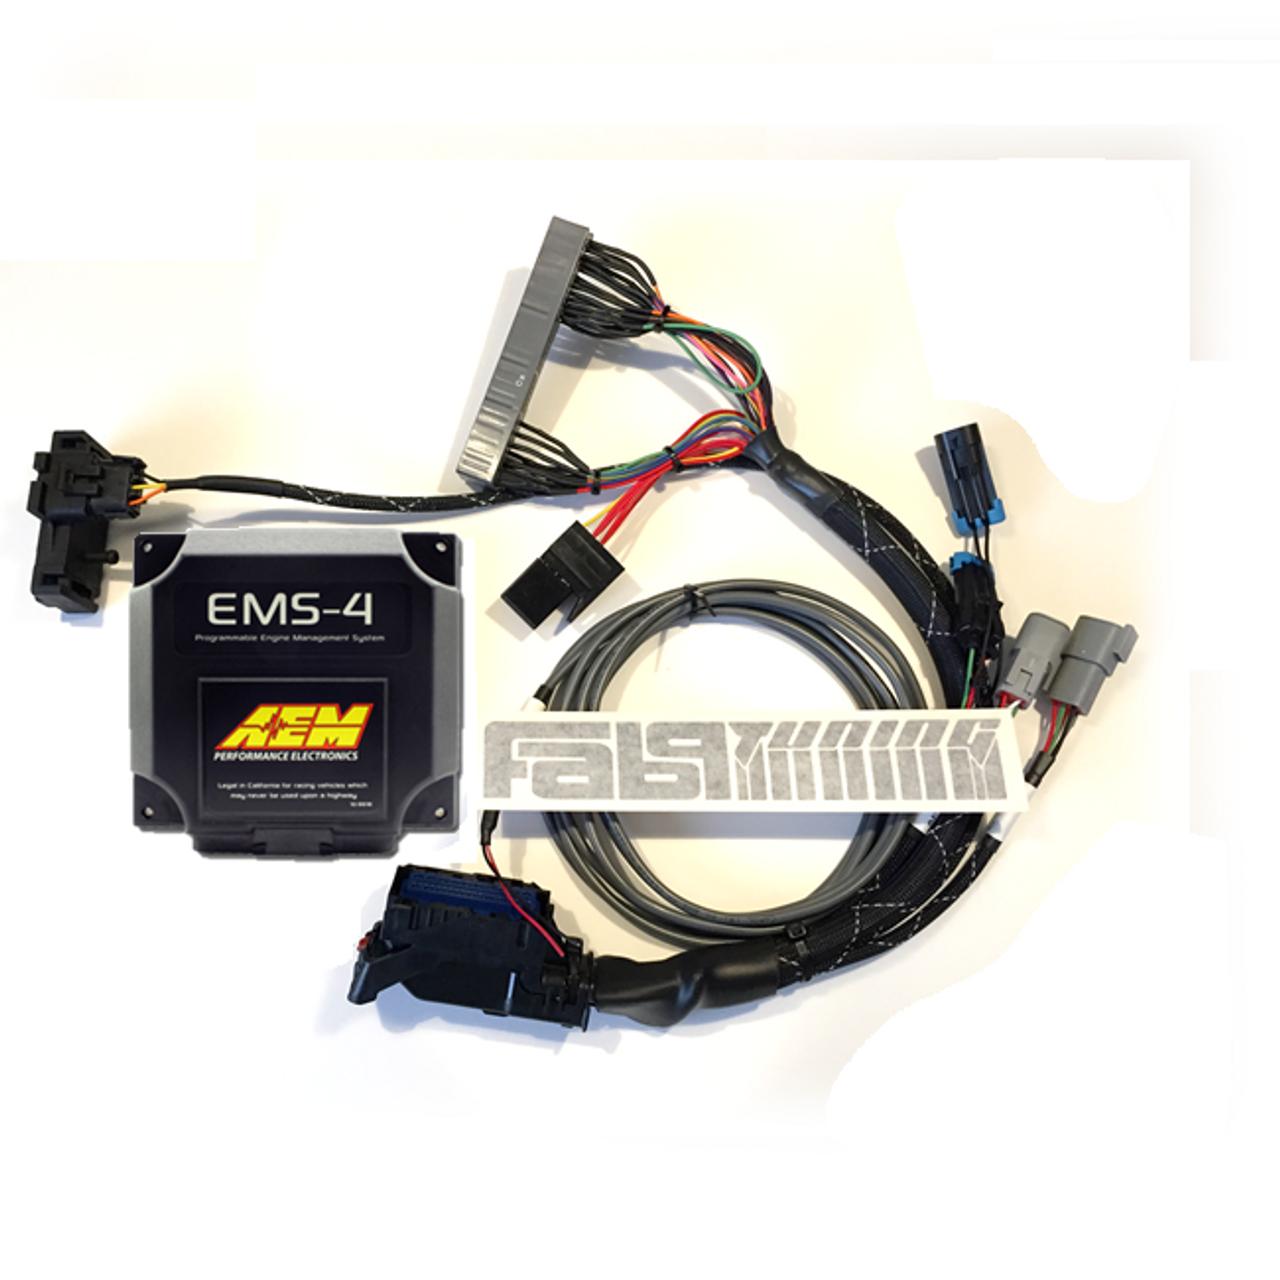 Aem Ems4 Stand Alone Engine Management Fab9tuning